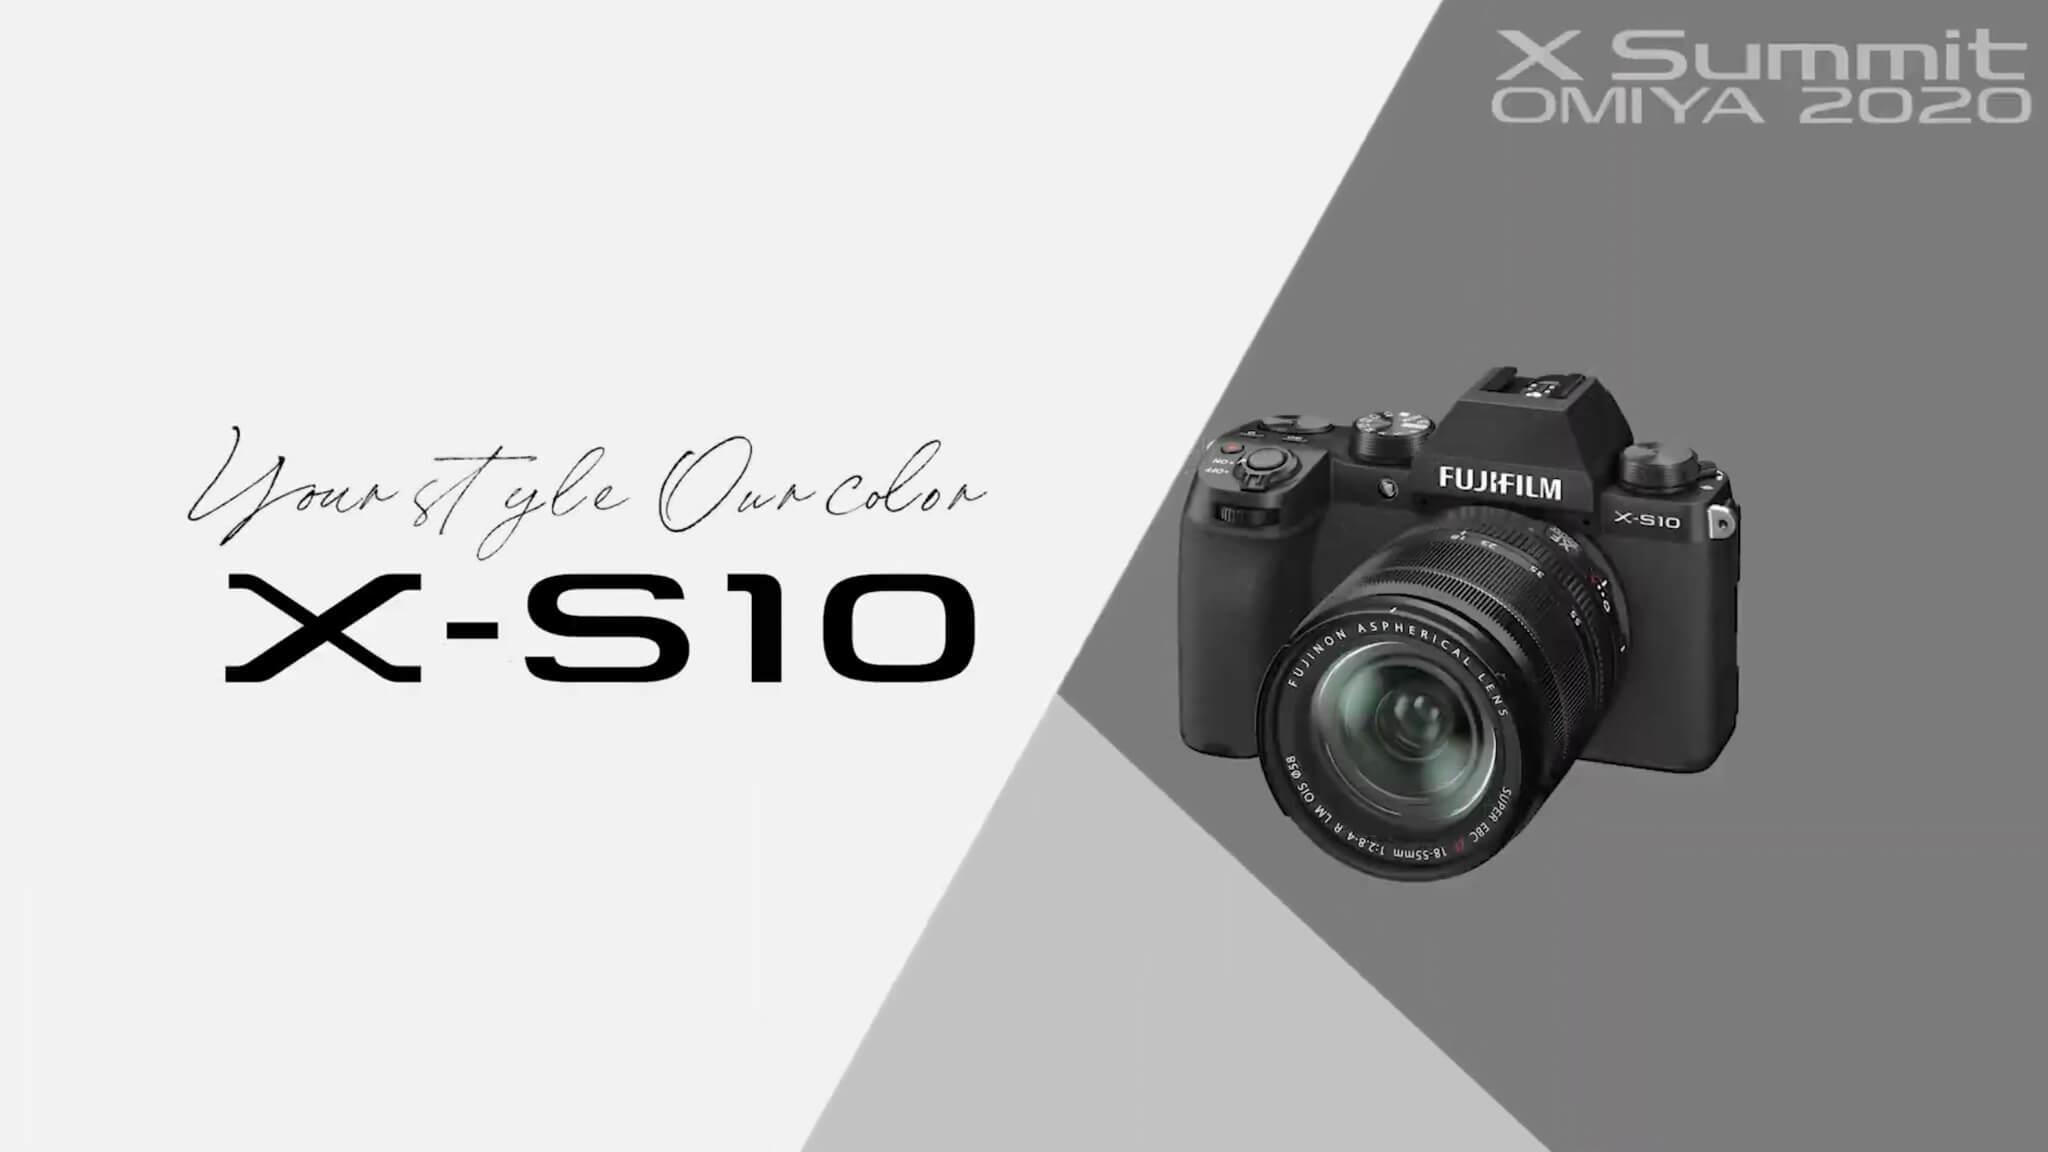 FUJIFILM X S10 Mirrorless Digital Camera Body Only 11